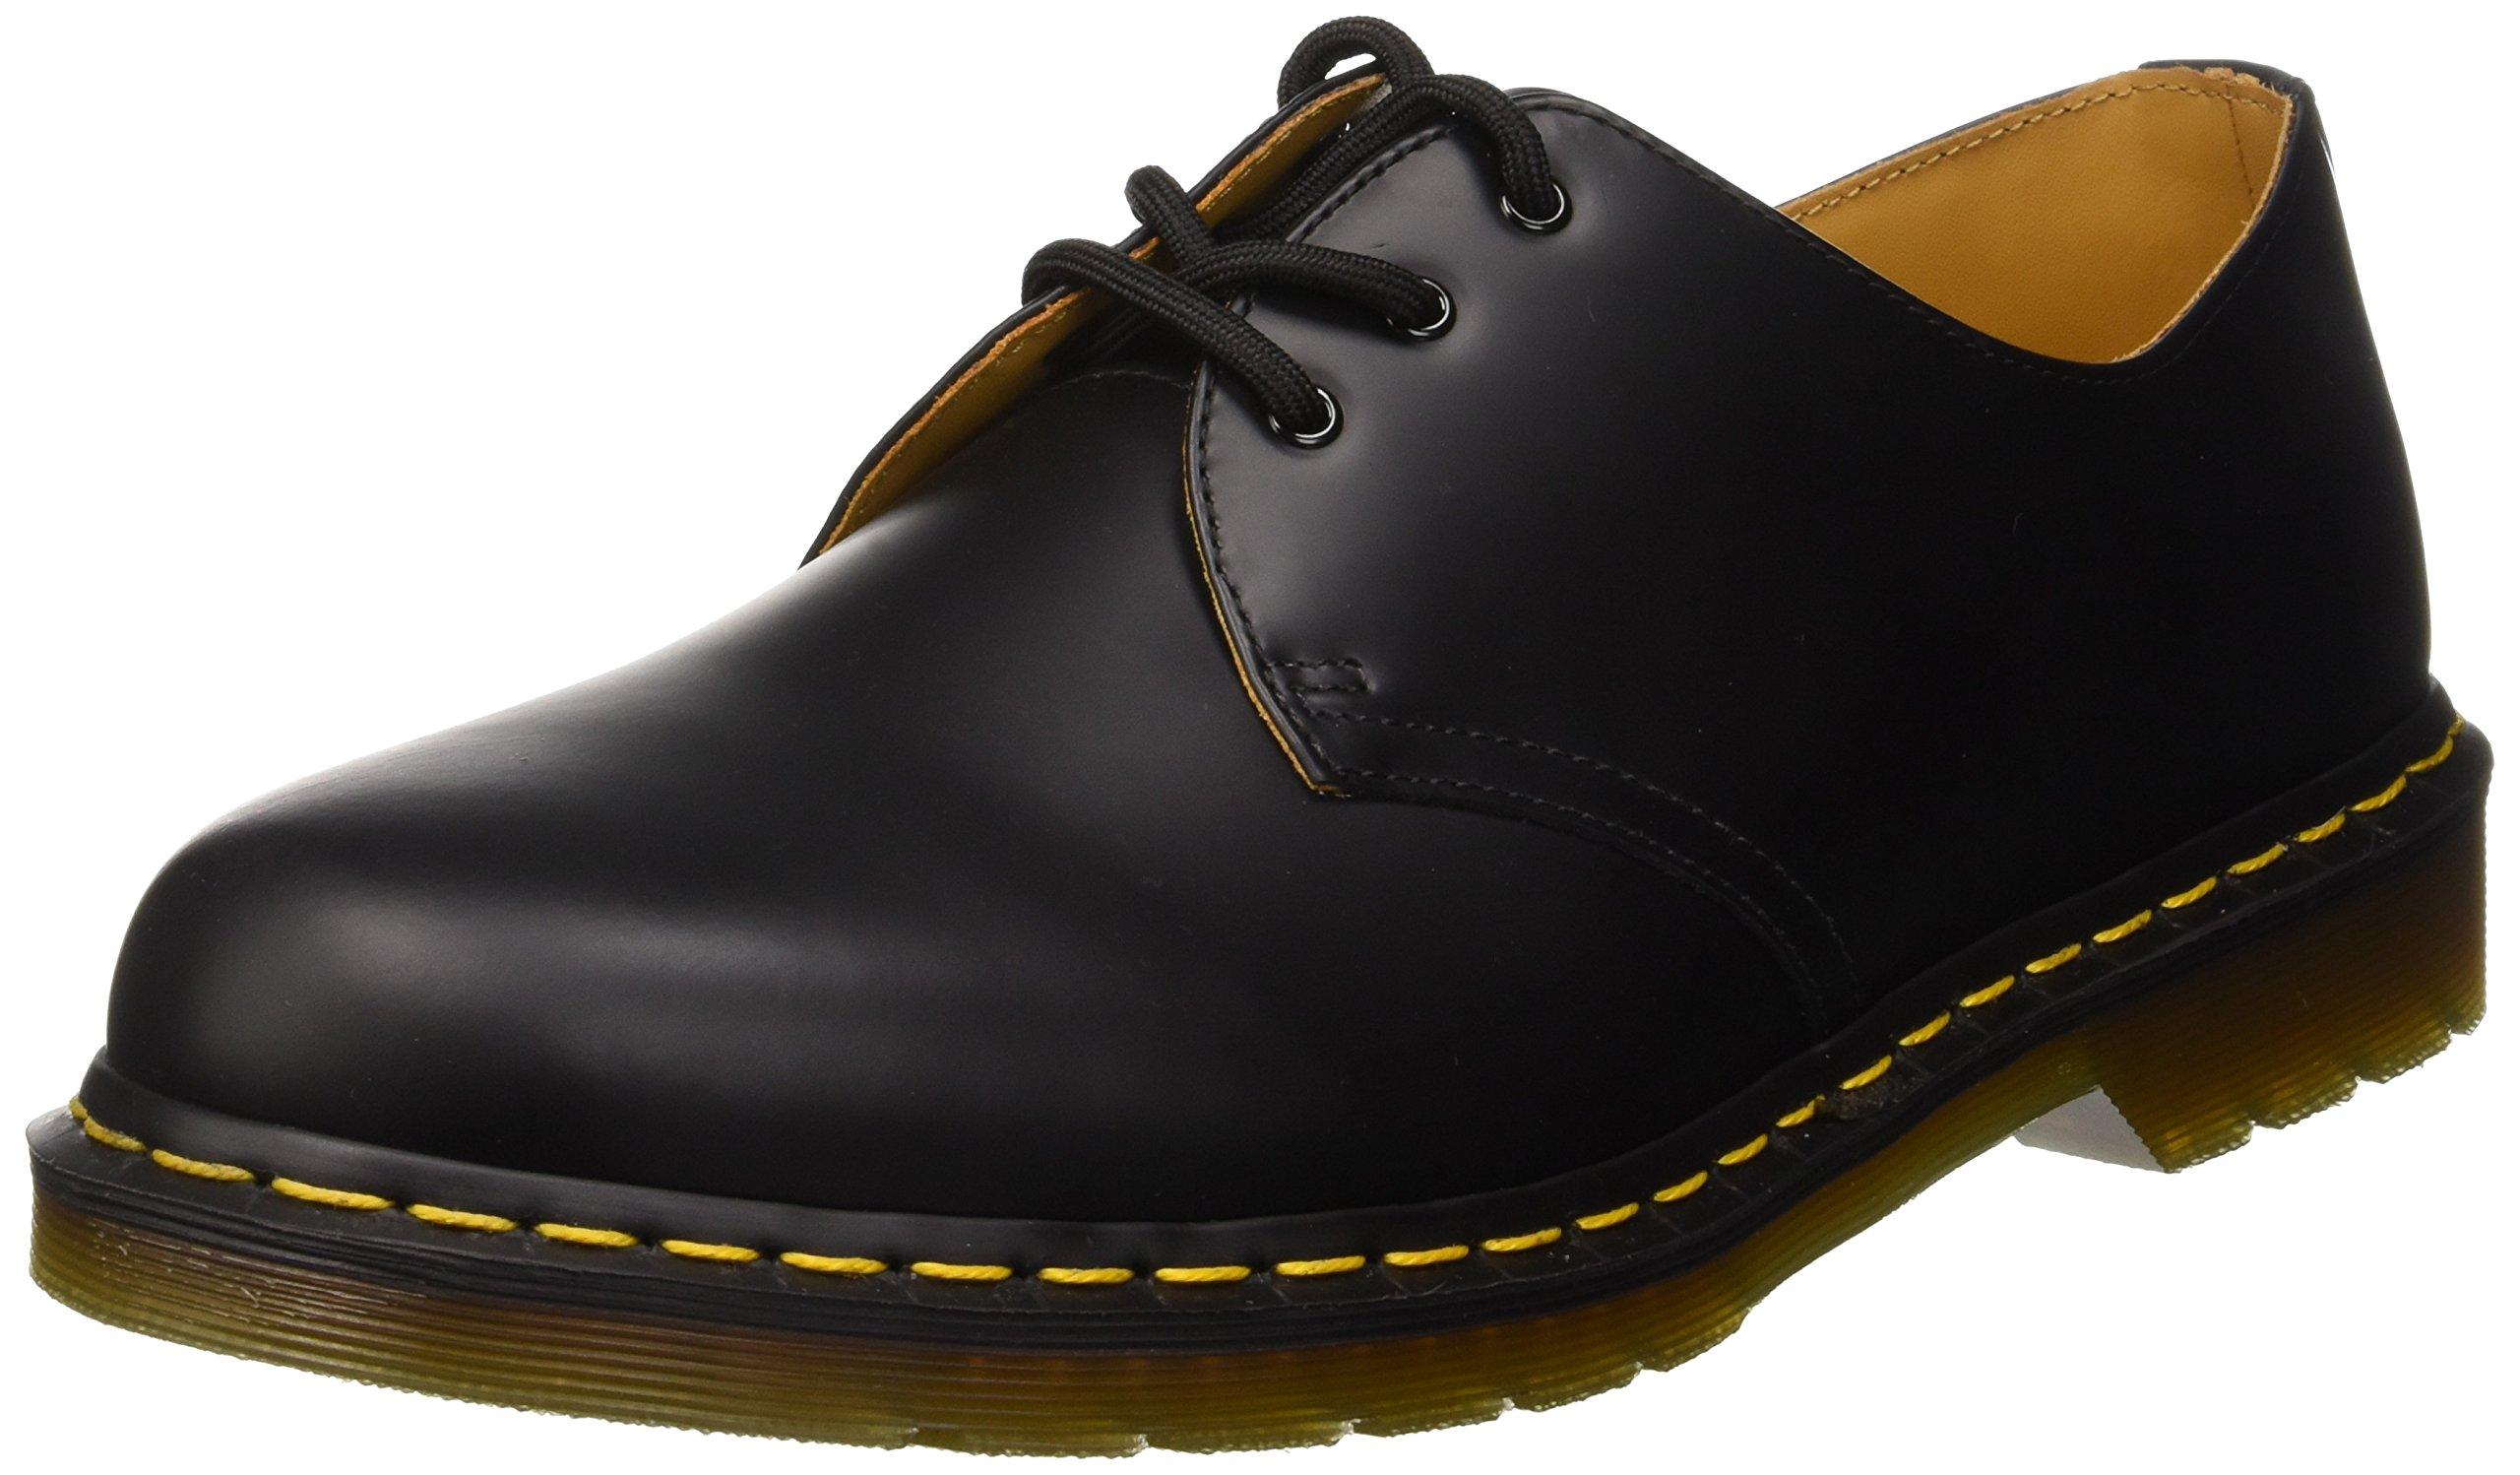 Dr. Martens Men's 1461 3 Eye Boot Shoe,Black Nappa,13 UK/14 M US